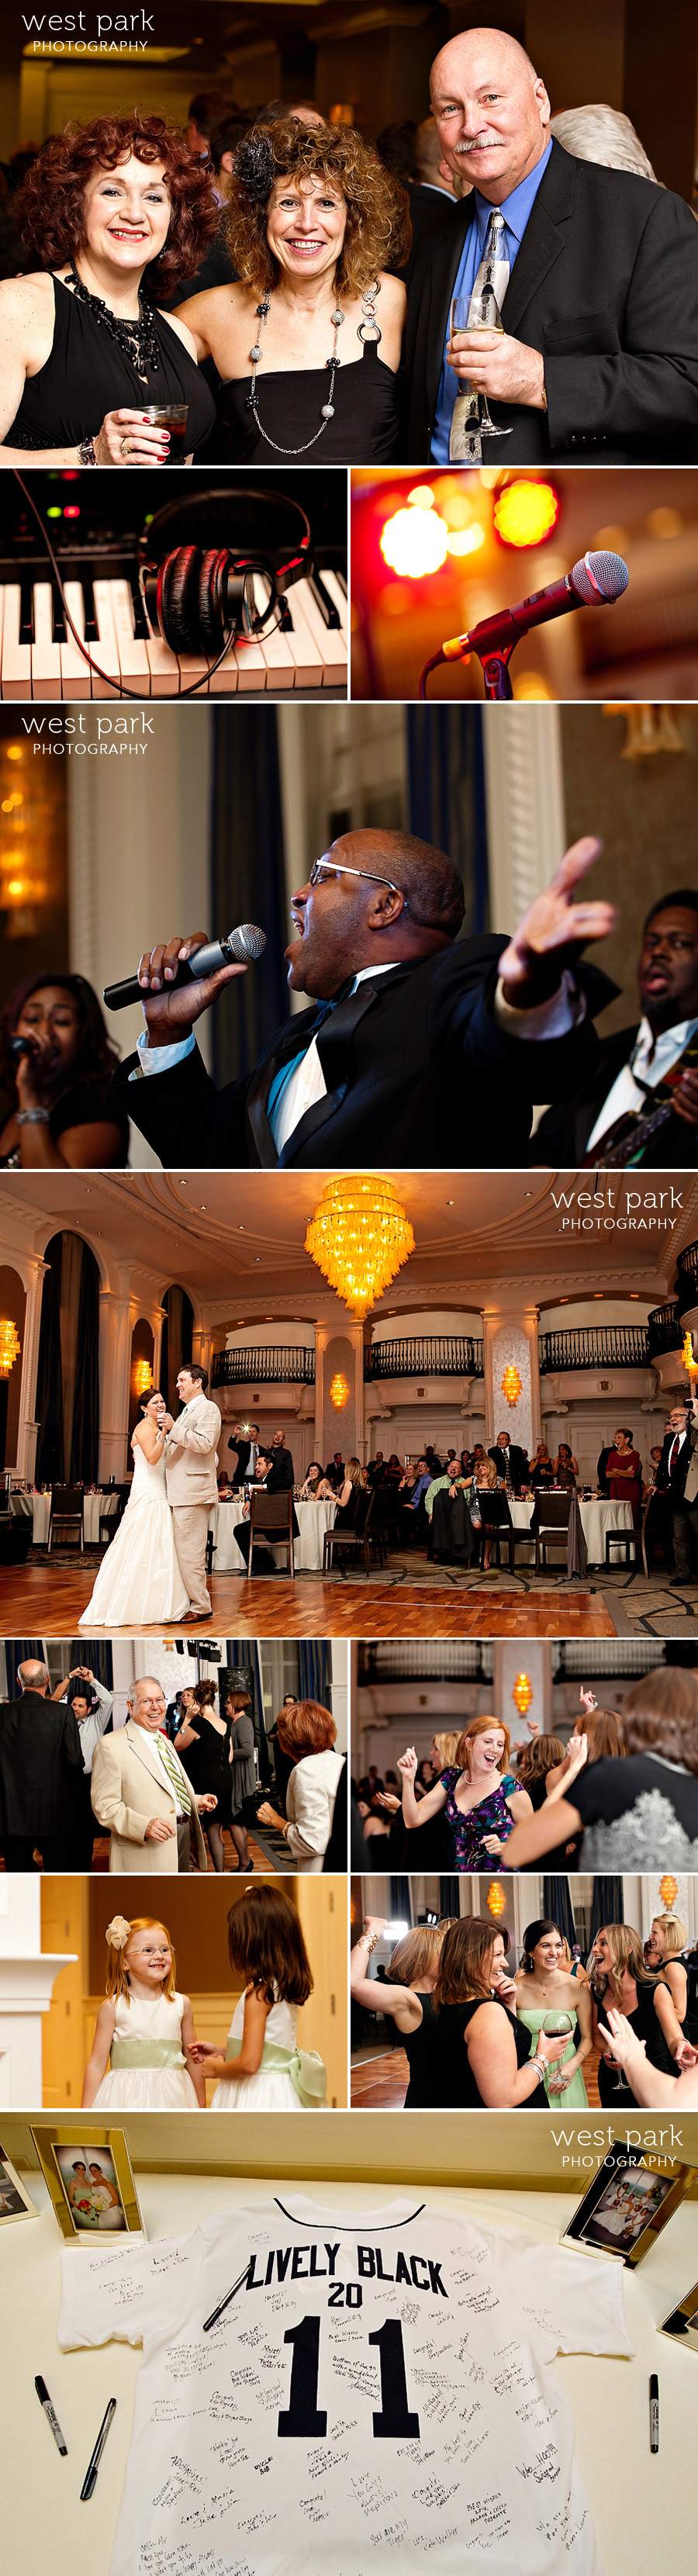 detroit book cadillac wedding photo 04 Kristi & Andrews Westin Book Cadillac Wedding